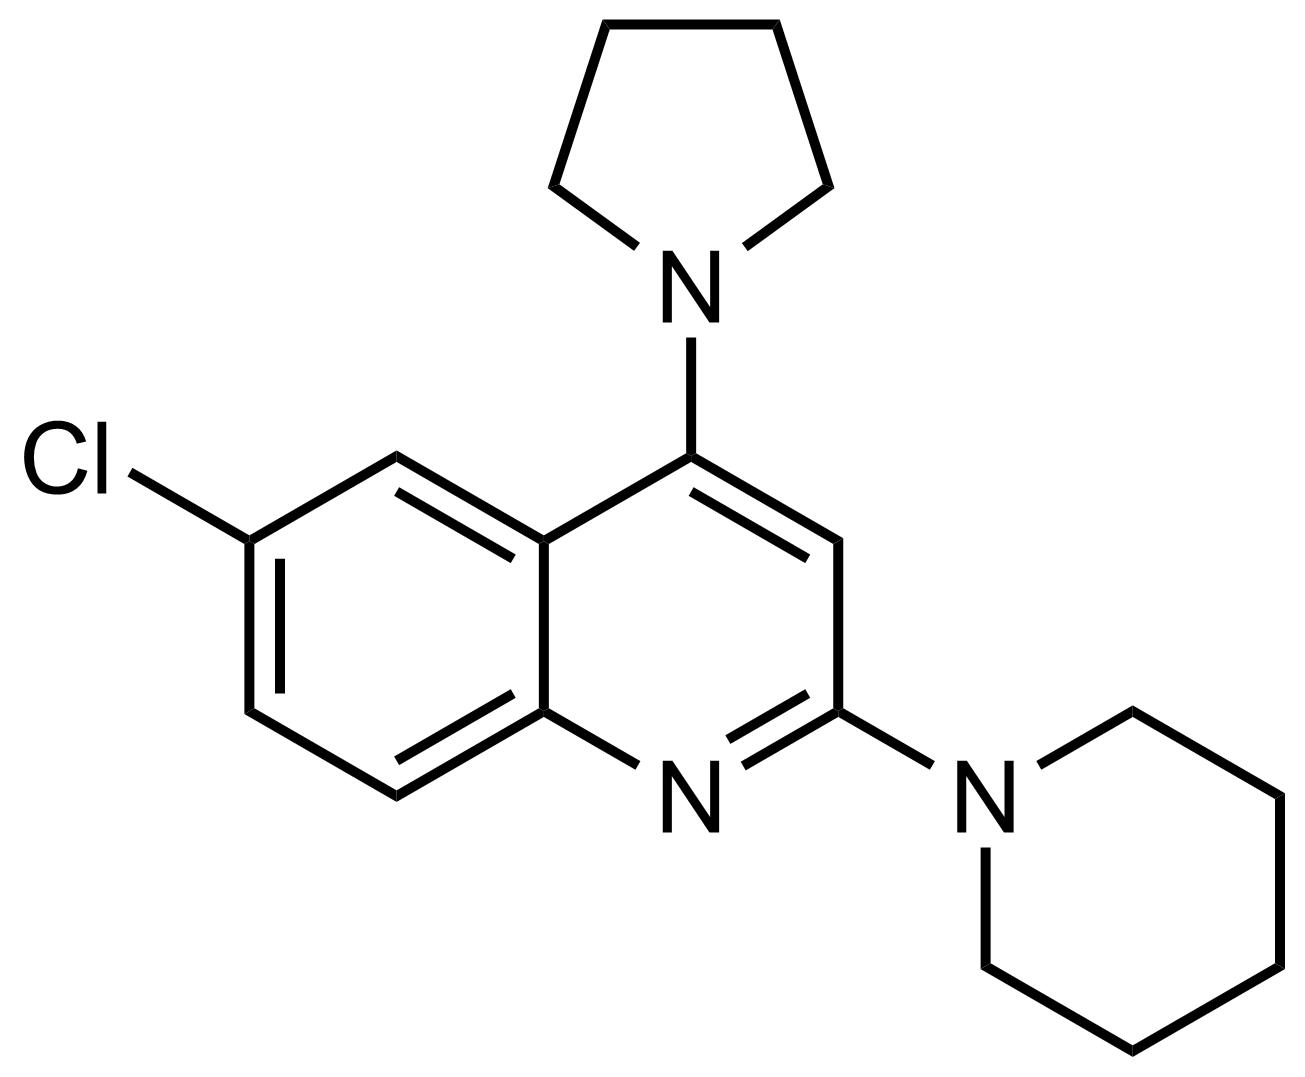 Structure of 6-Chloro-2-(piperidin-1-yl)-4-(pyrrolidin-1-yl)quinoline